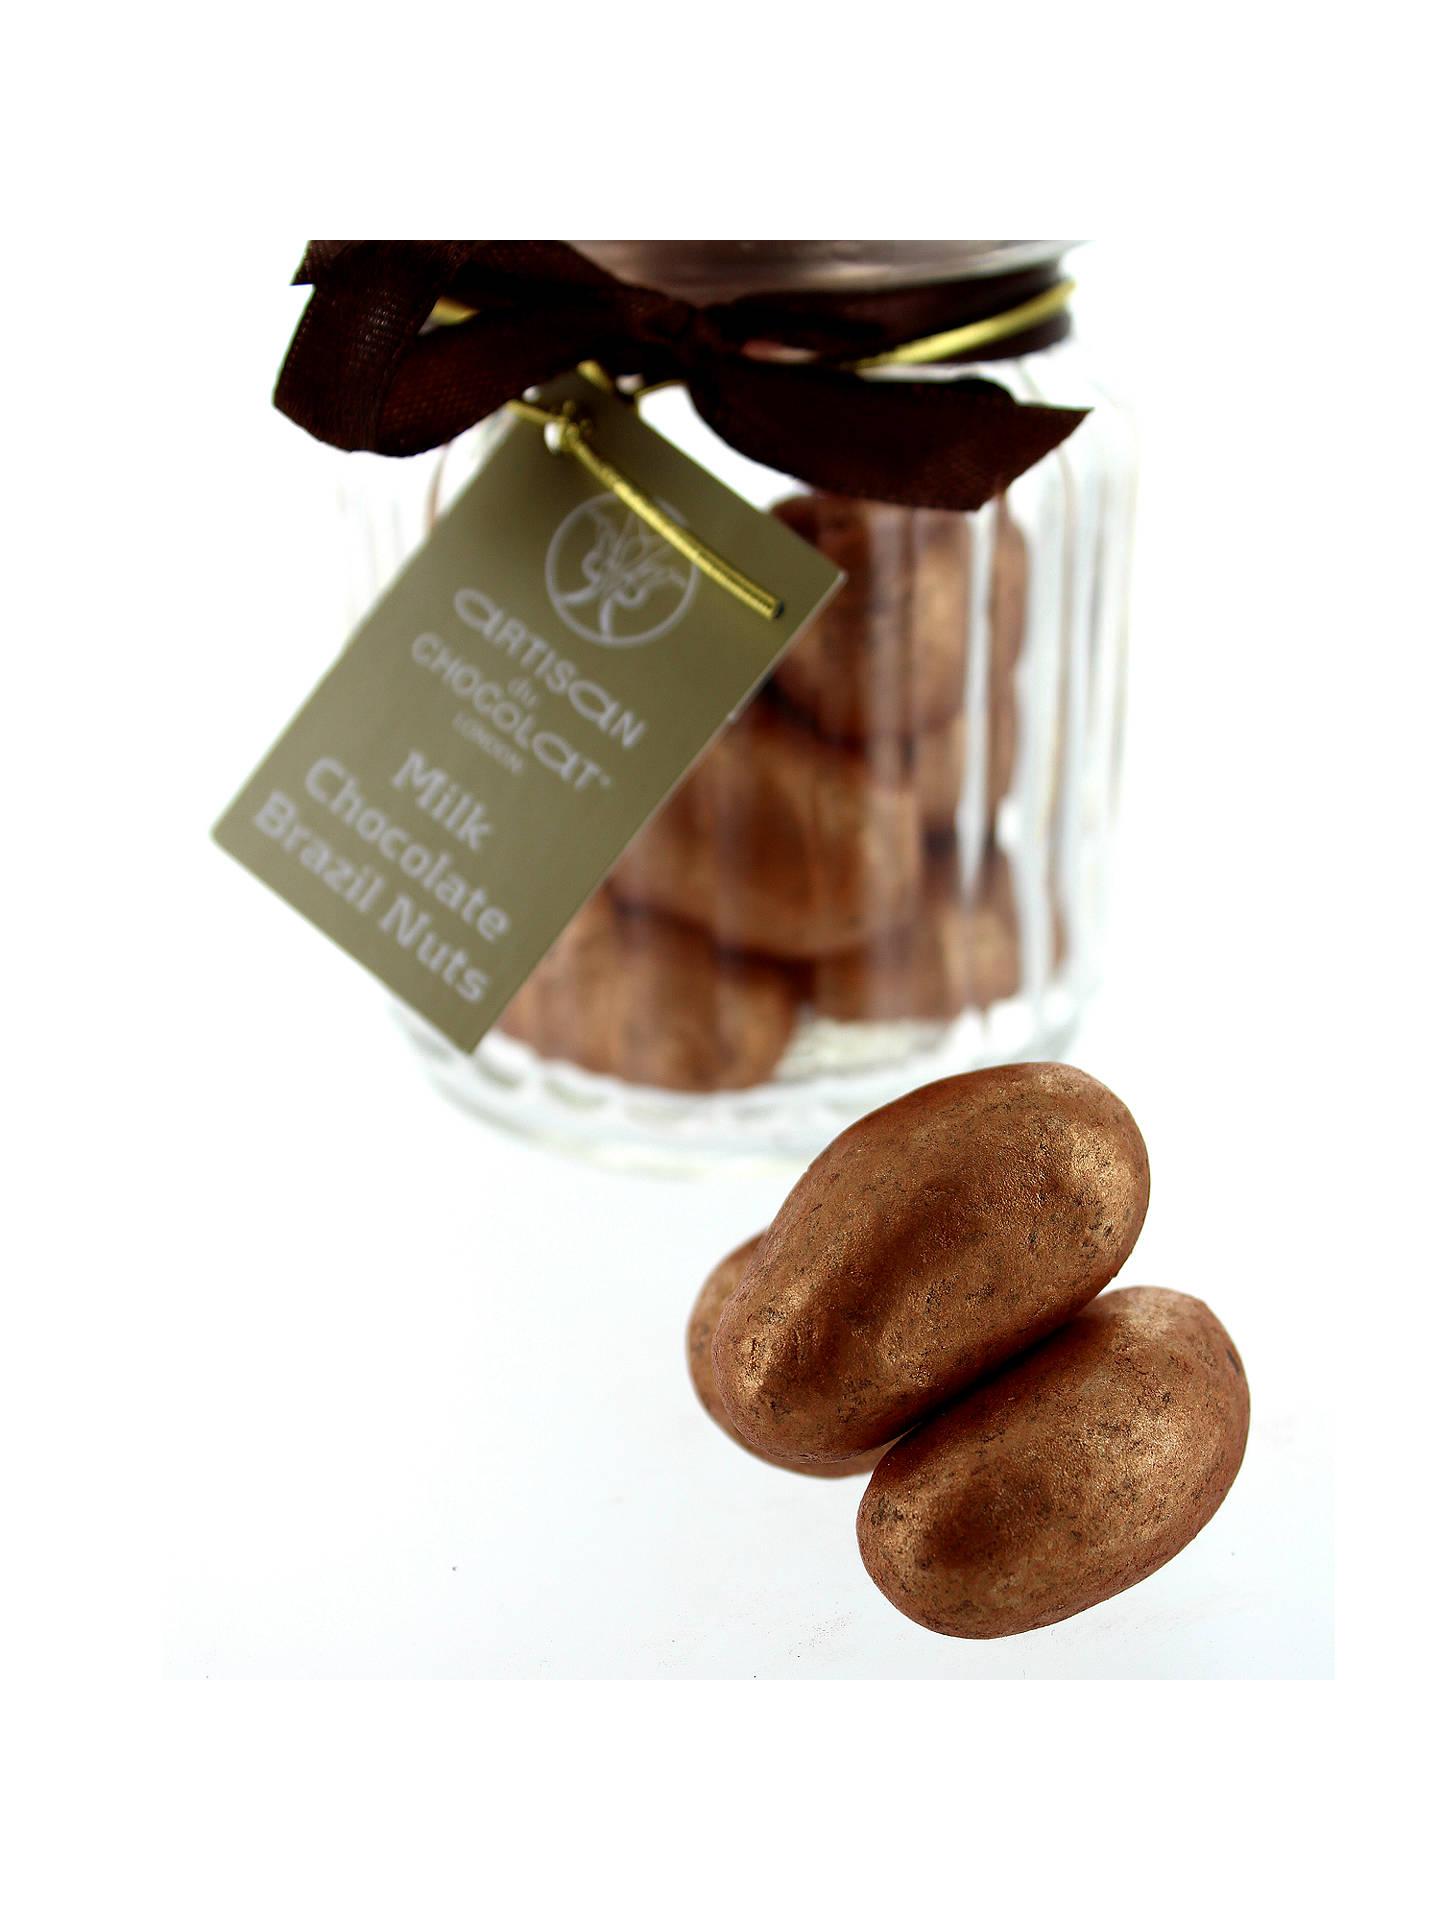 Artisan Du Chocolat Milk Chocolate Brazil Nuts Squirrel Jar